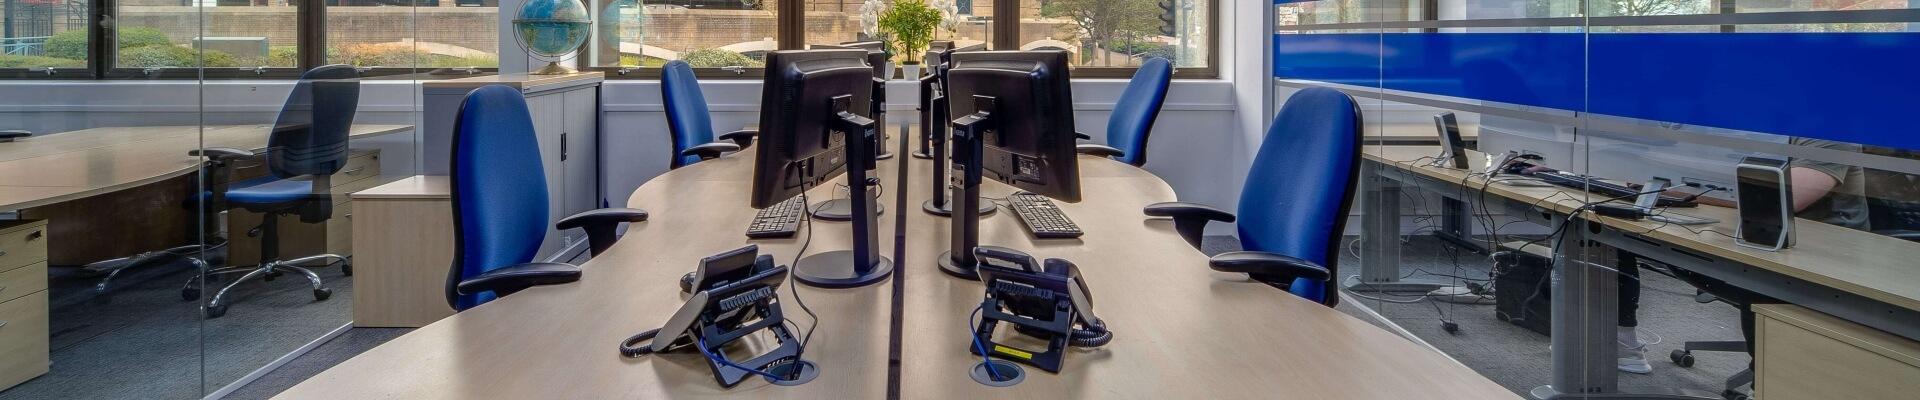 Desk-team-our-story